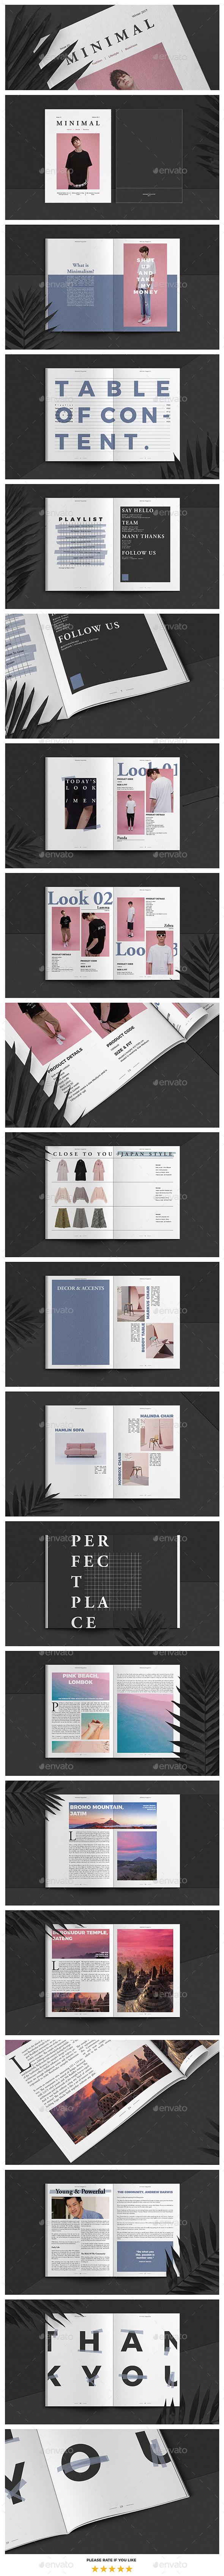 Fashion Lifestyle and Business Magazine - Magazines Print Templates